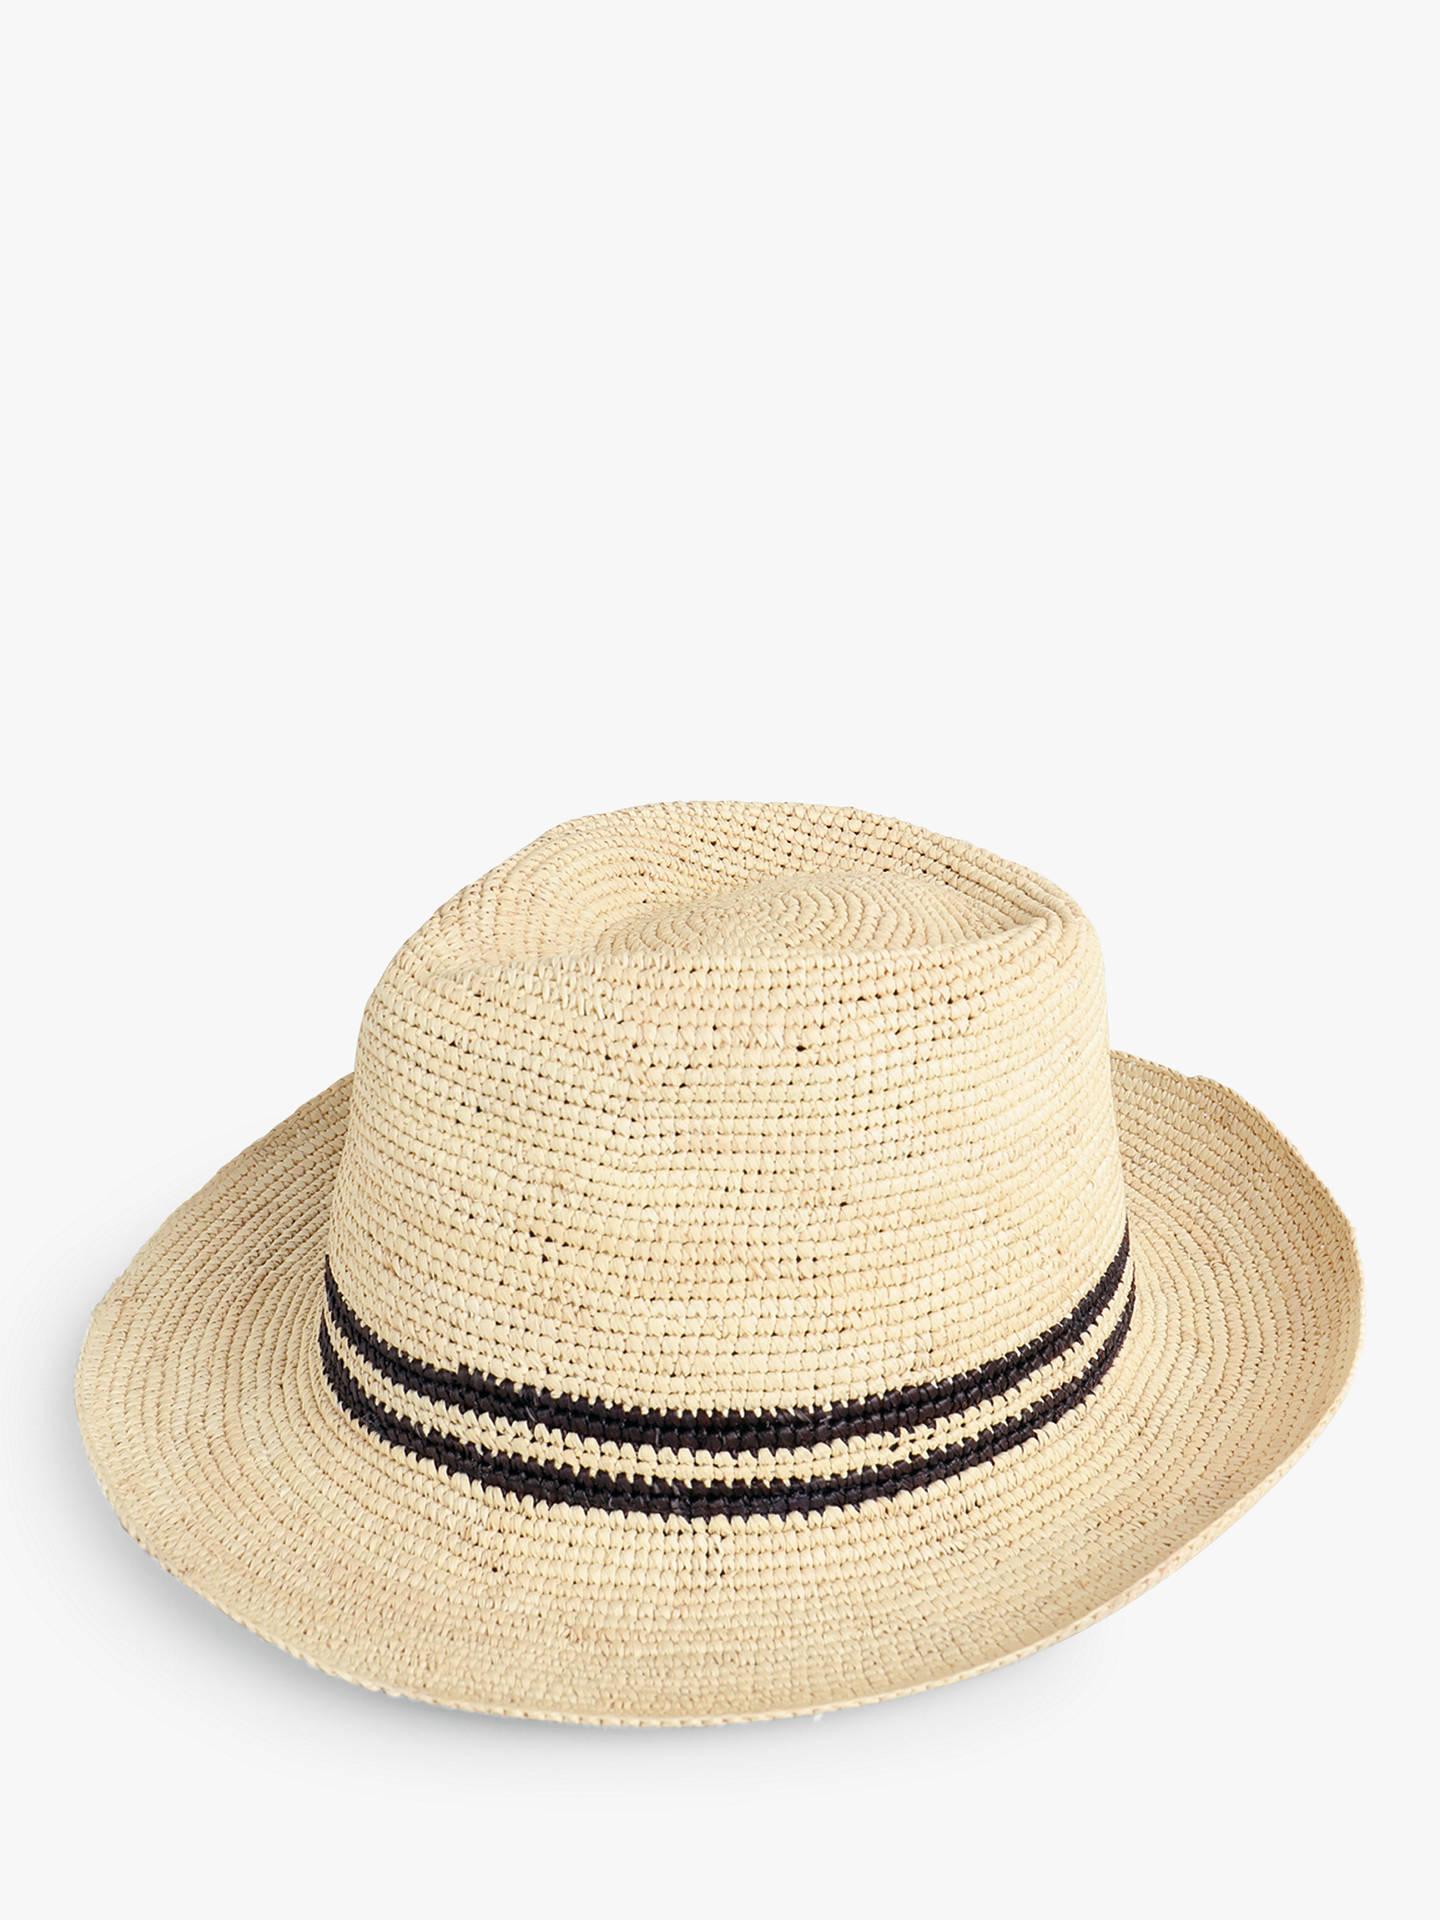 3c24c1f68 hush Crochet Panama Hat, Natural at John Lewis & Partners